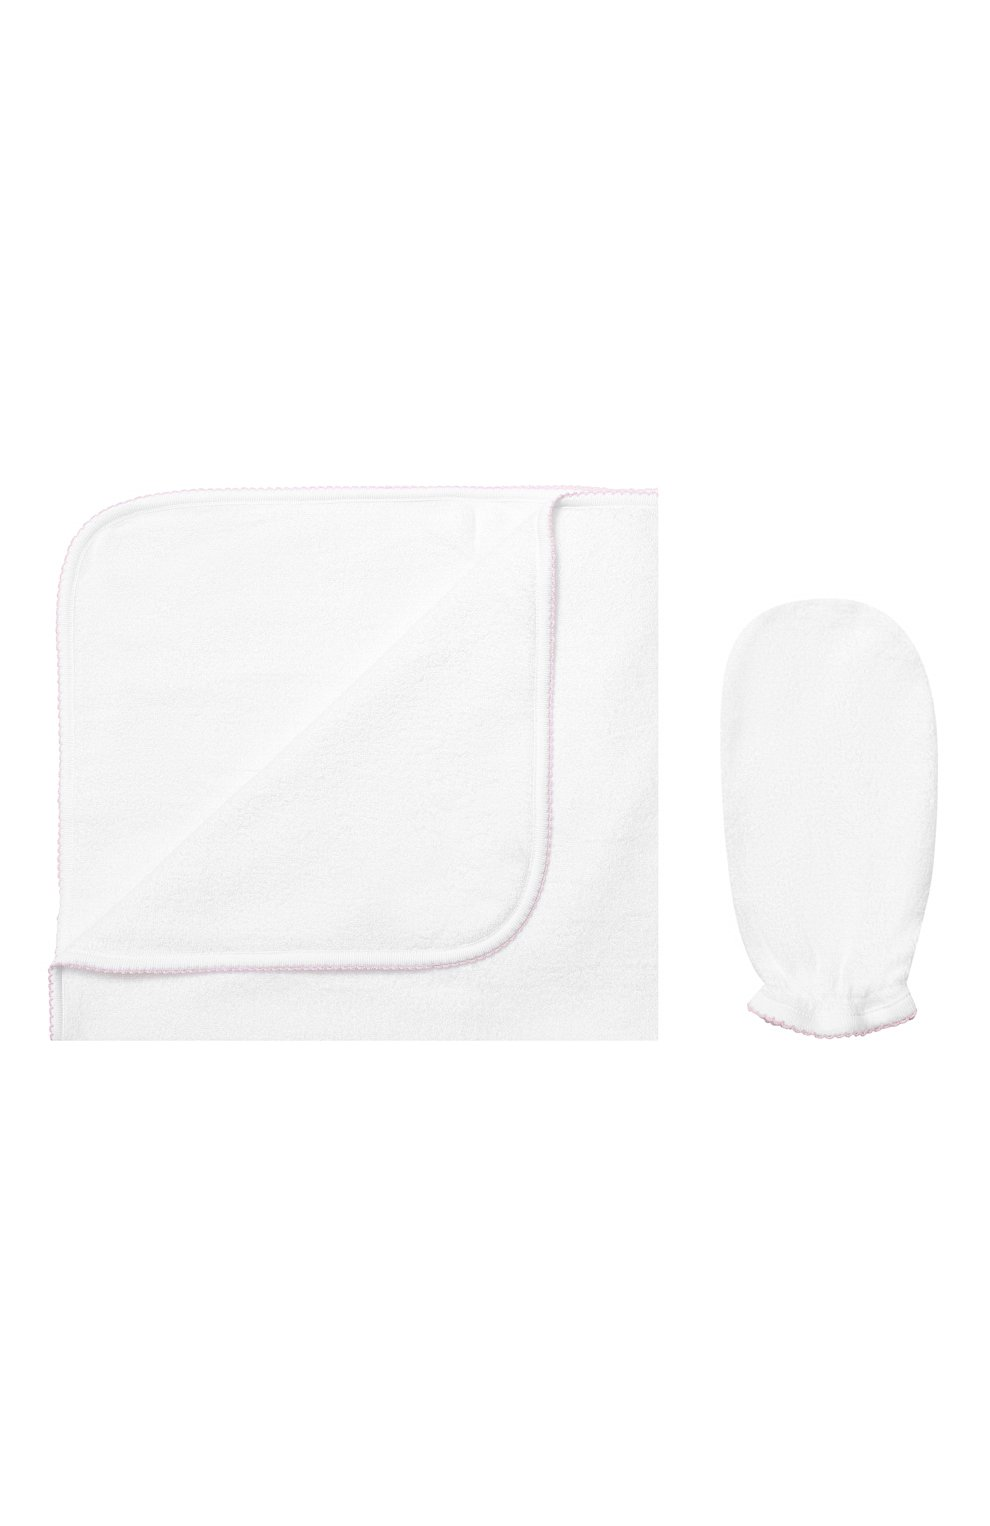 Детского комплект из полотенца и рукавицы KISSY KISSY белого цвета, арт. 48609   Фото 1 (Статус проверки: Проверена категория)